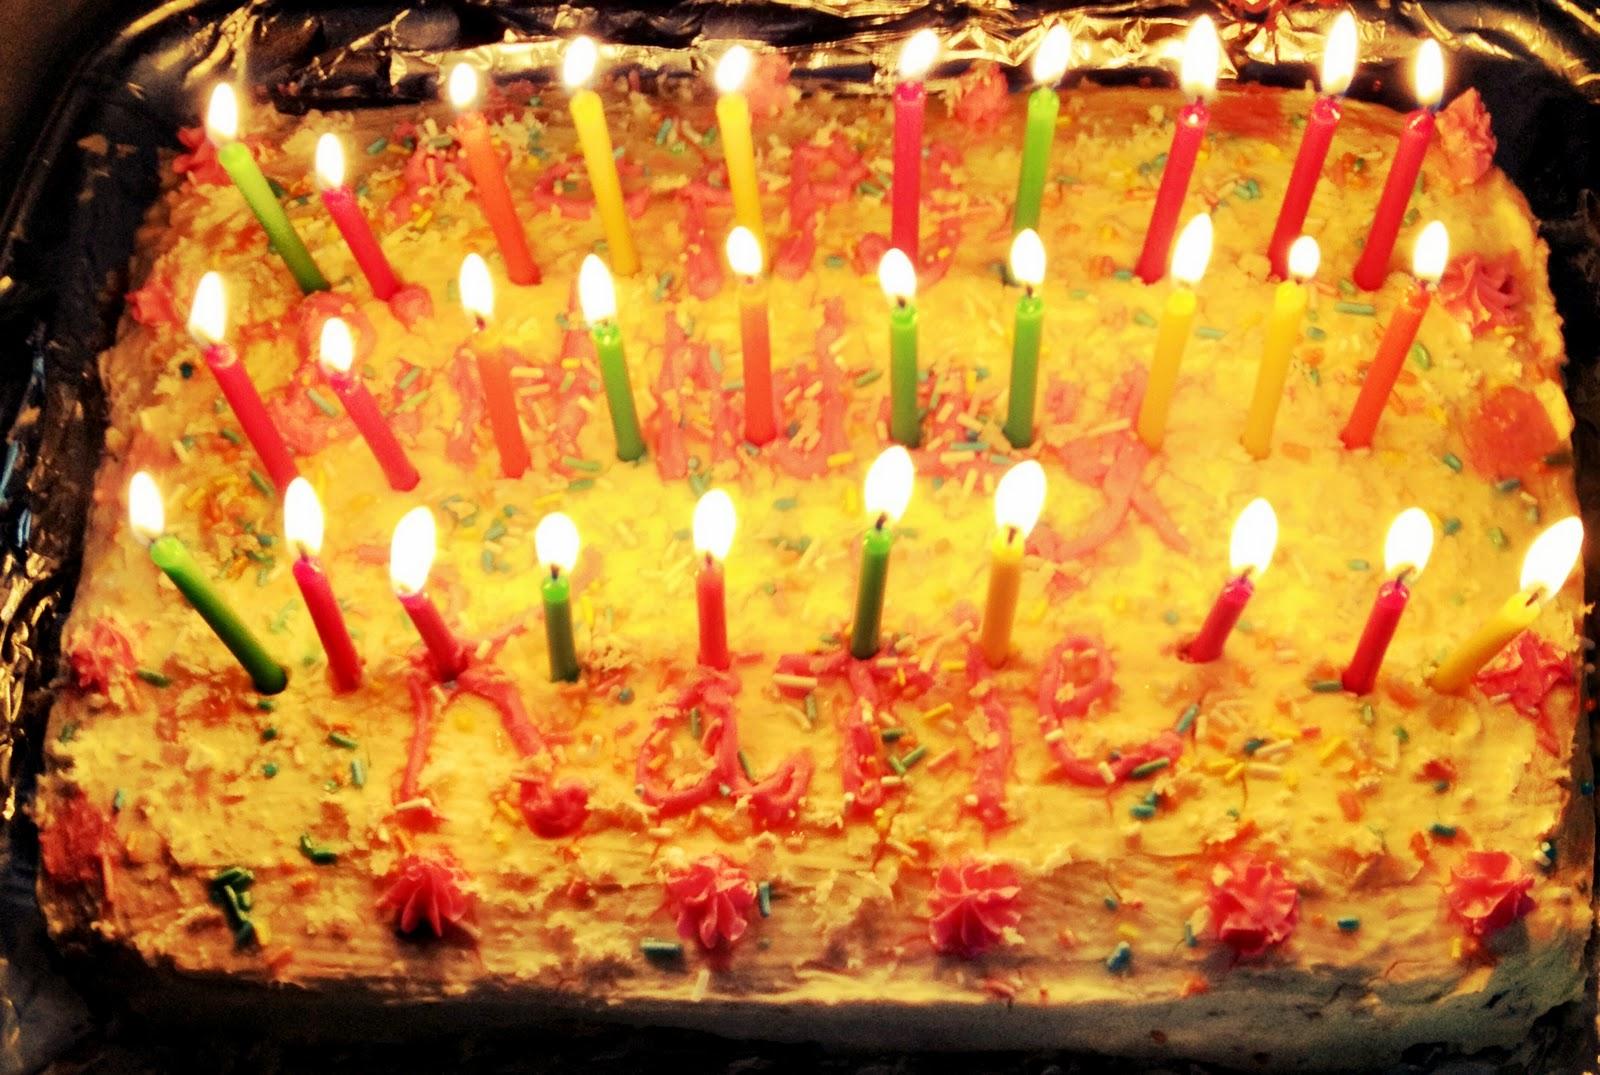 Cake Georgetown Restaurant Cake Ideas And Designs